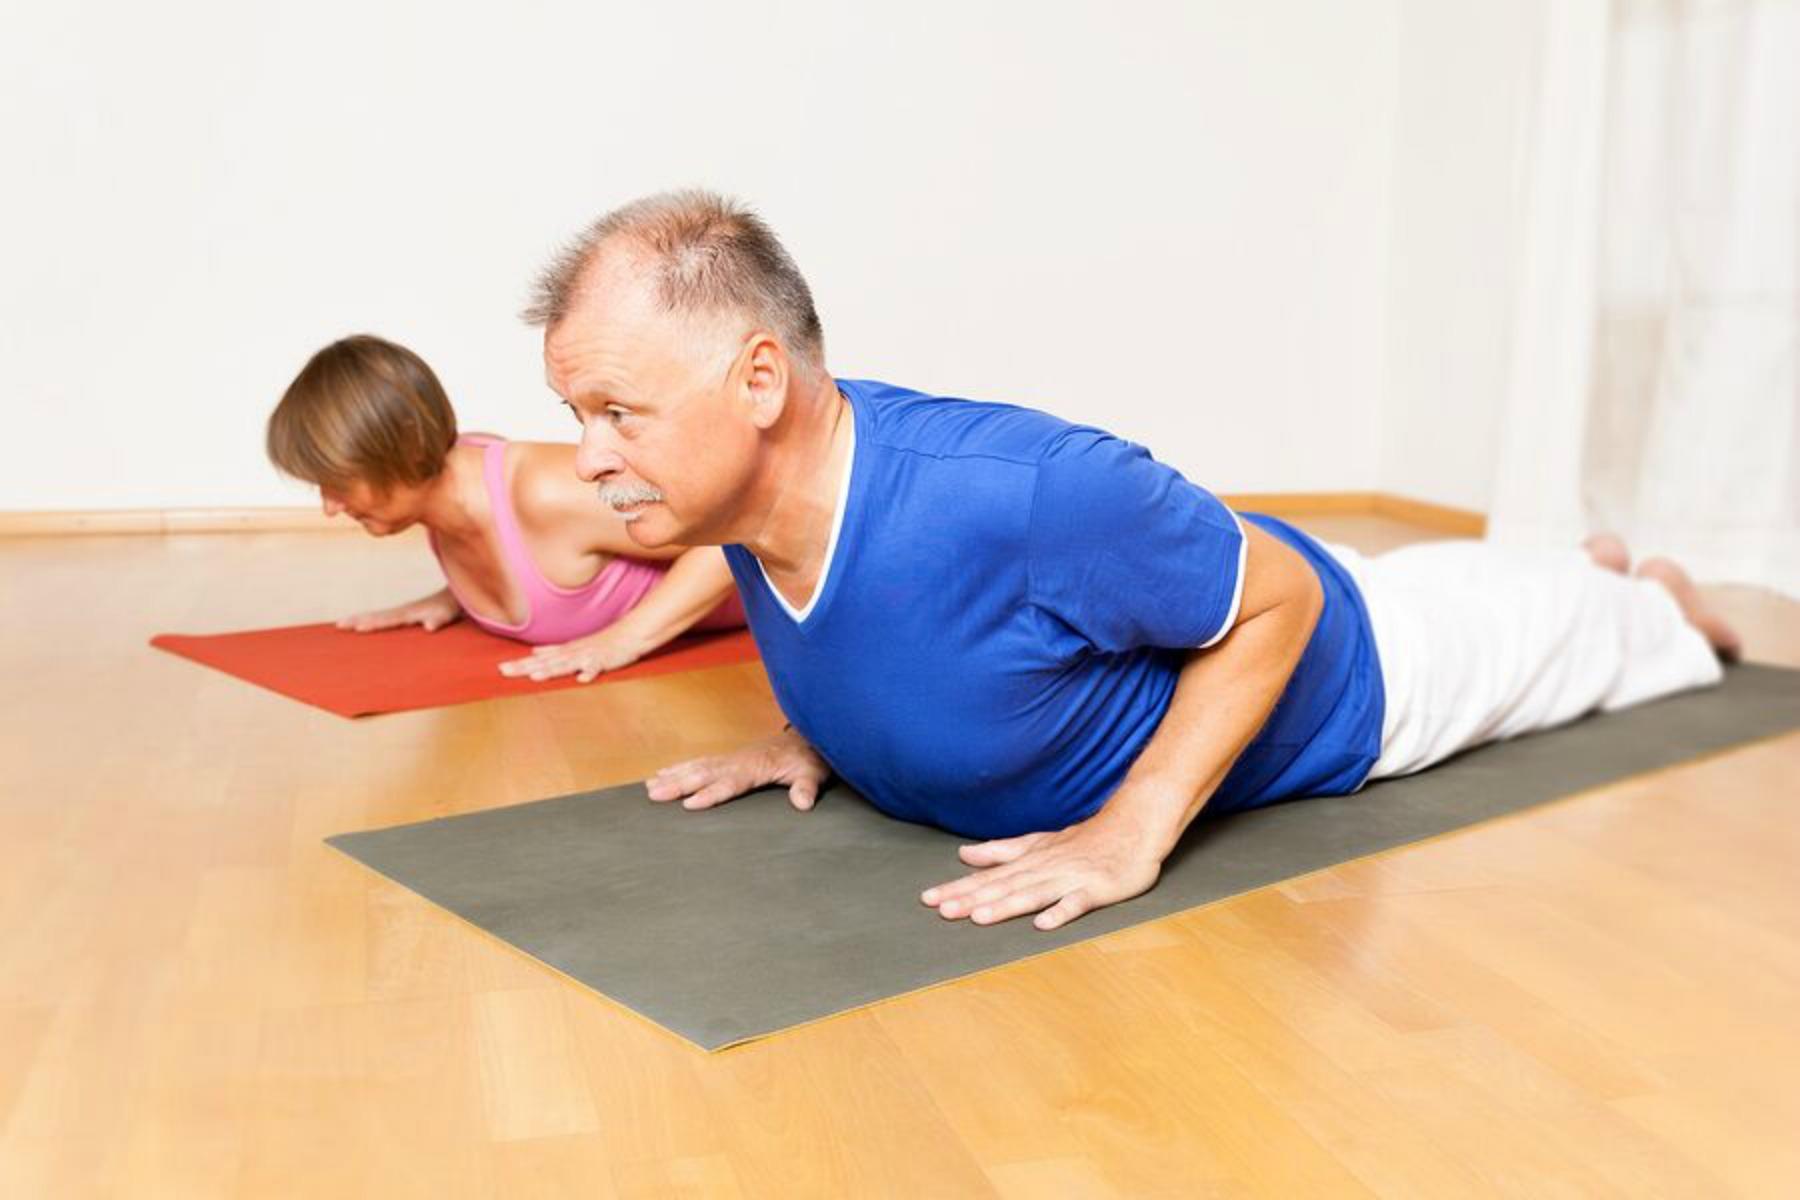 Home Care in Litchfield Park AZ: Six Exercise Programs